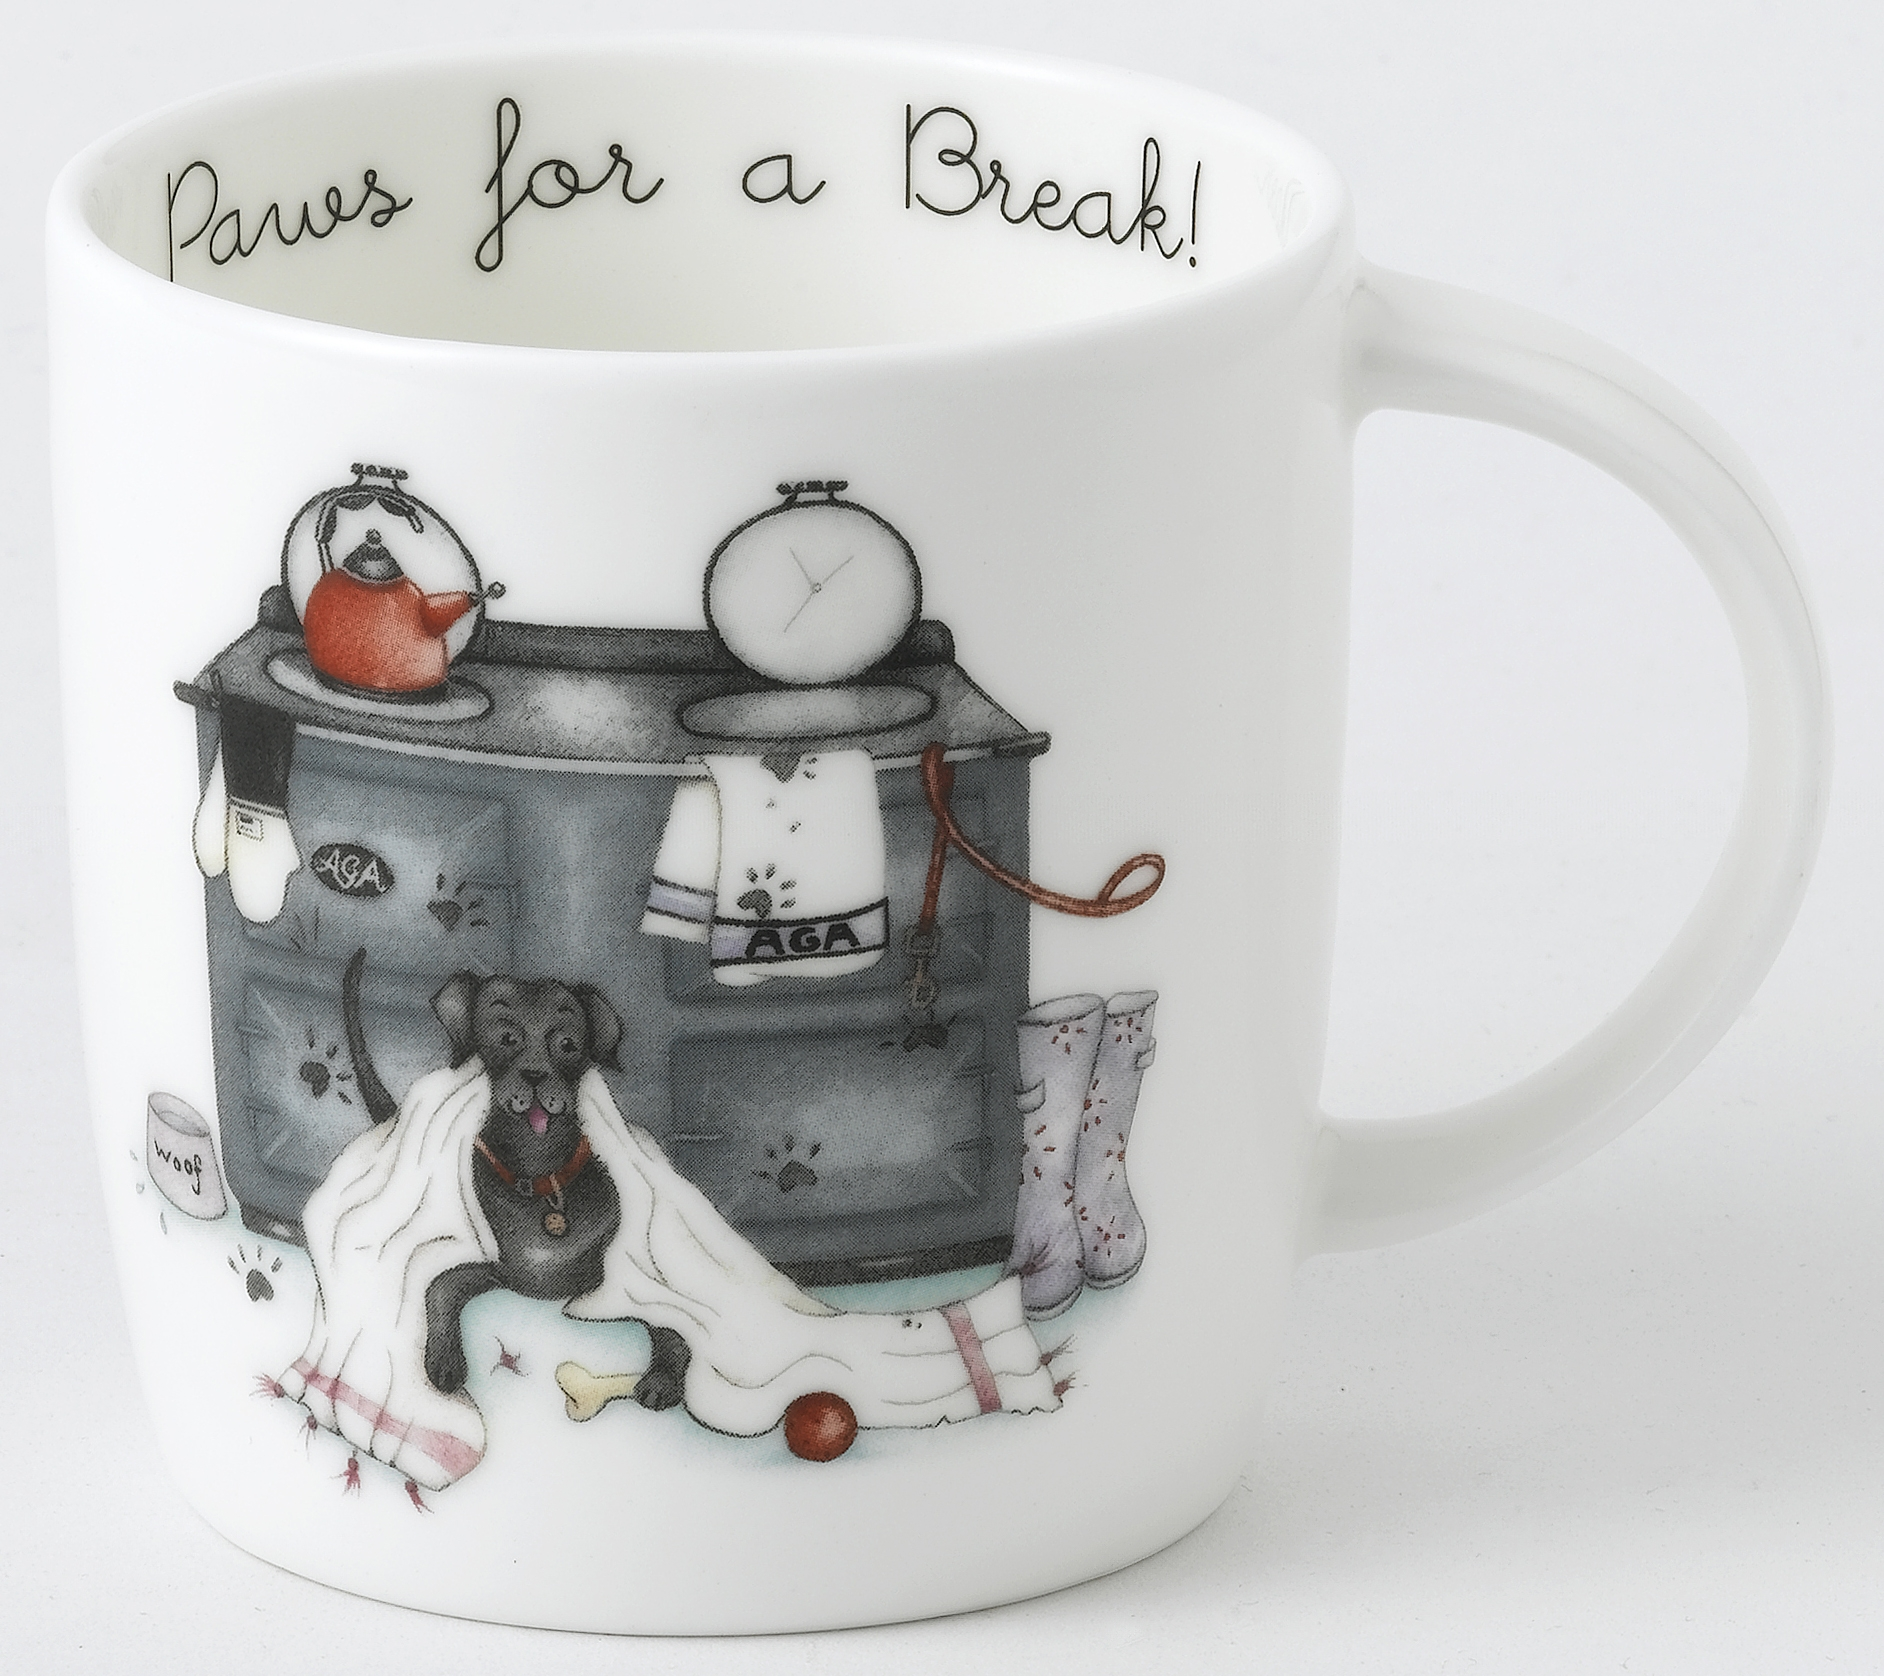 AGA Mug Designs by Berni Parker - Paws for a Break